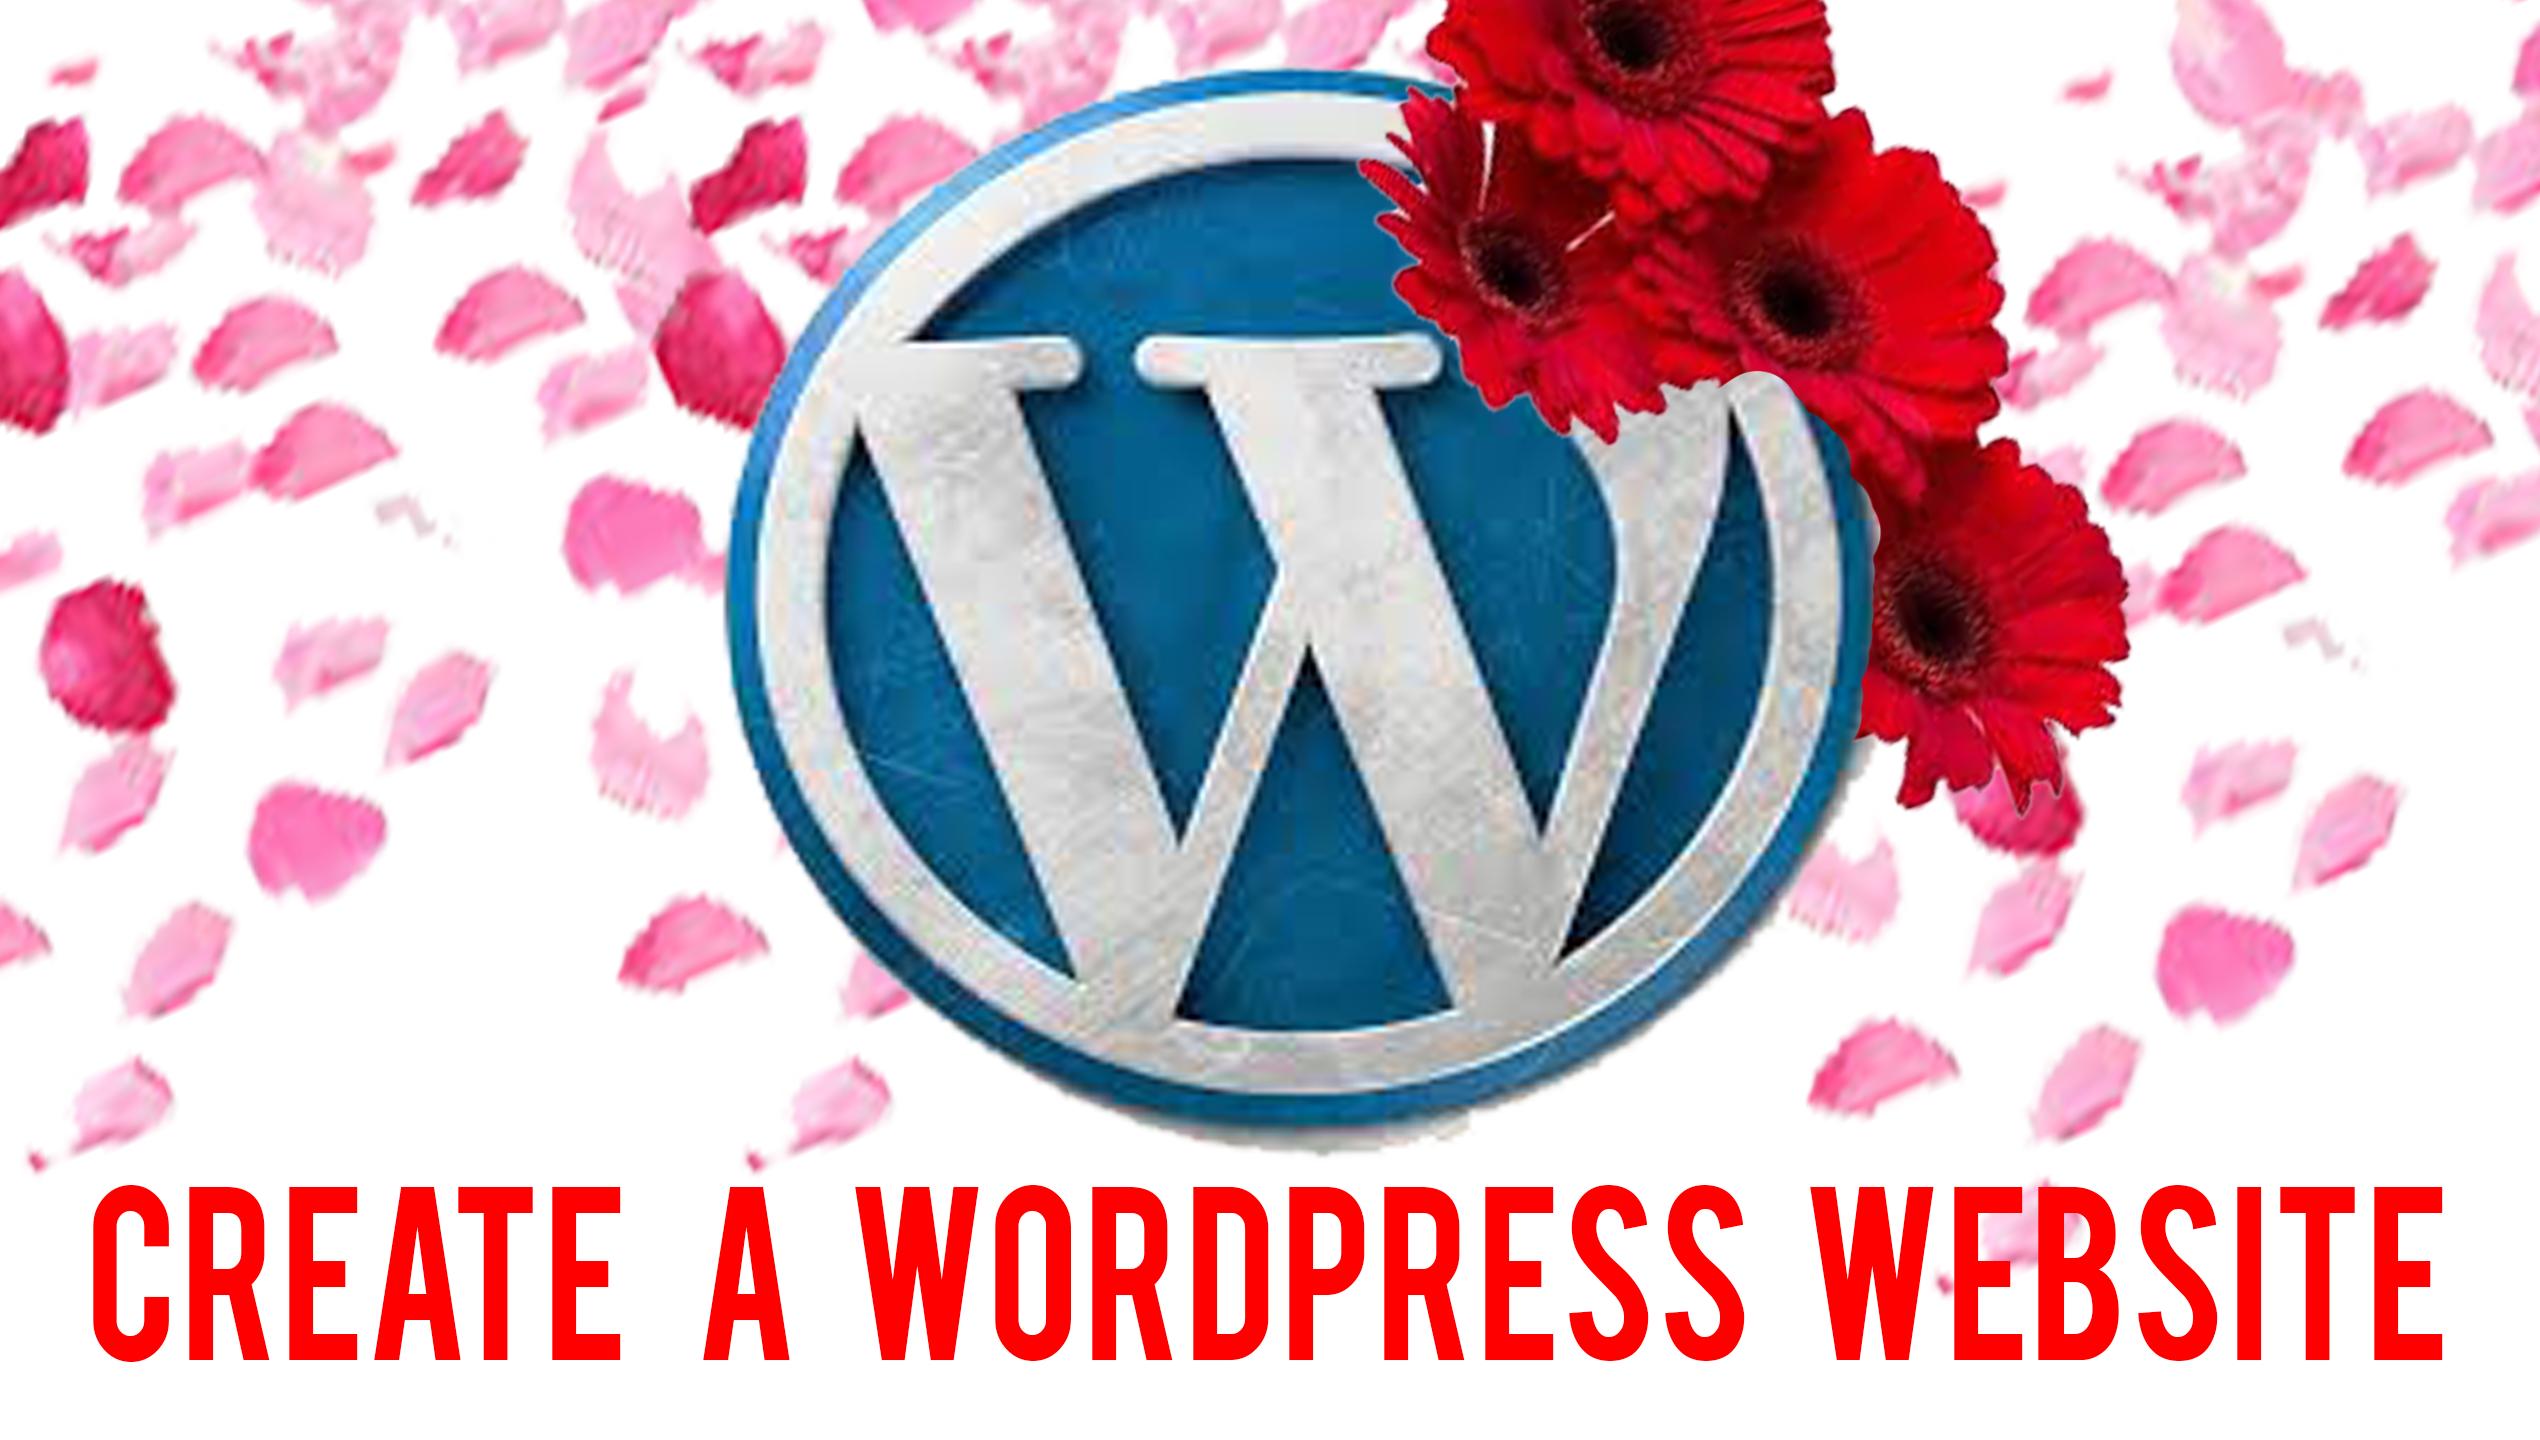 I WILL CREATE A BEAUTIFUL WORDPRESS WEBSITE FOR YOU